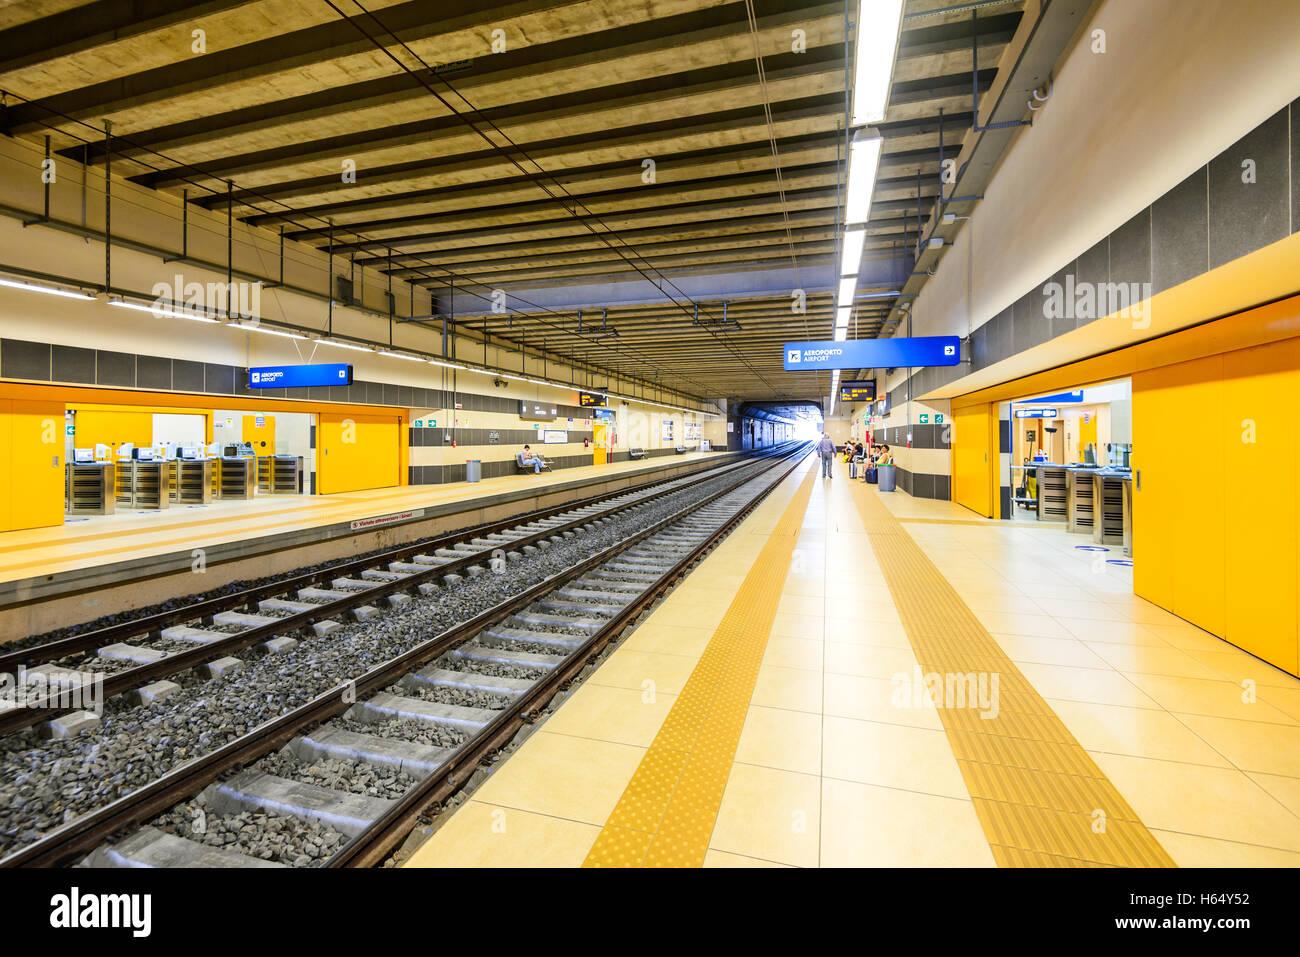 Aeroporto Bari : Bari italy july aeroporto is a railway station opened